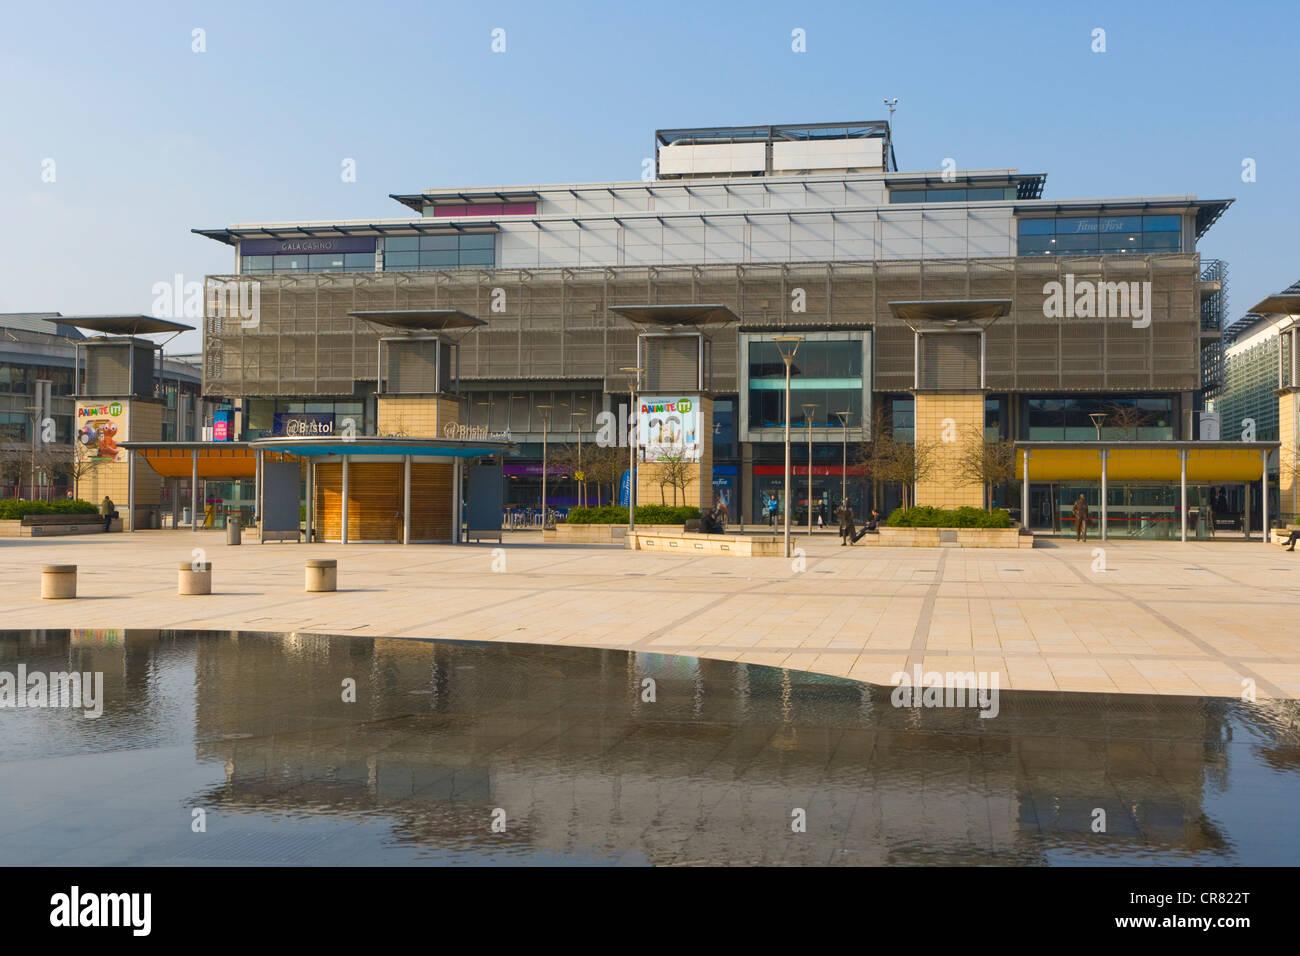 Millennium Square, Harbourside, Canon's Wharf, Bristol, Gloucestershire, England, United Kingdom, Europe - Stock Image